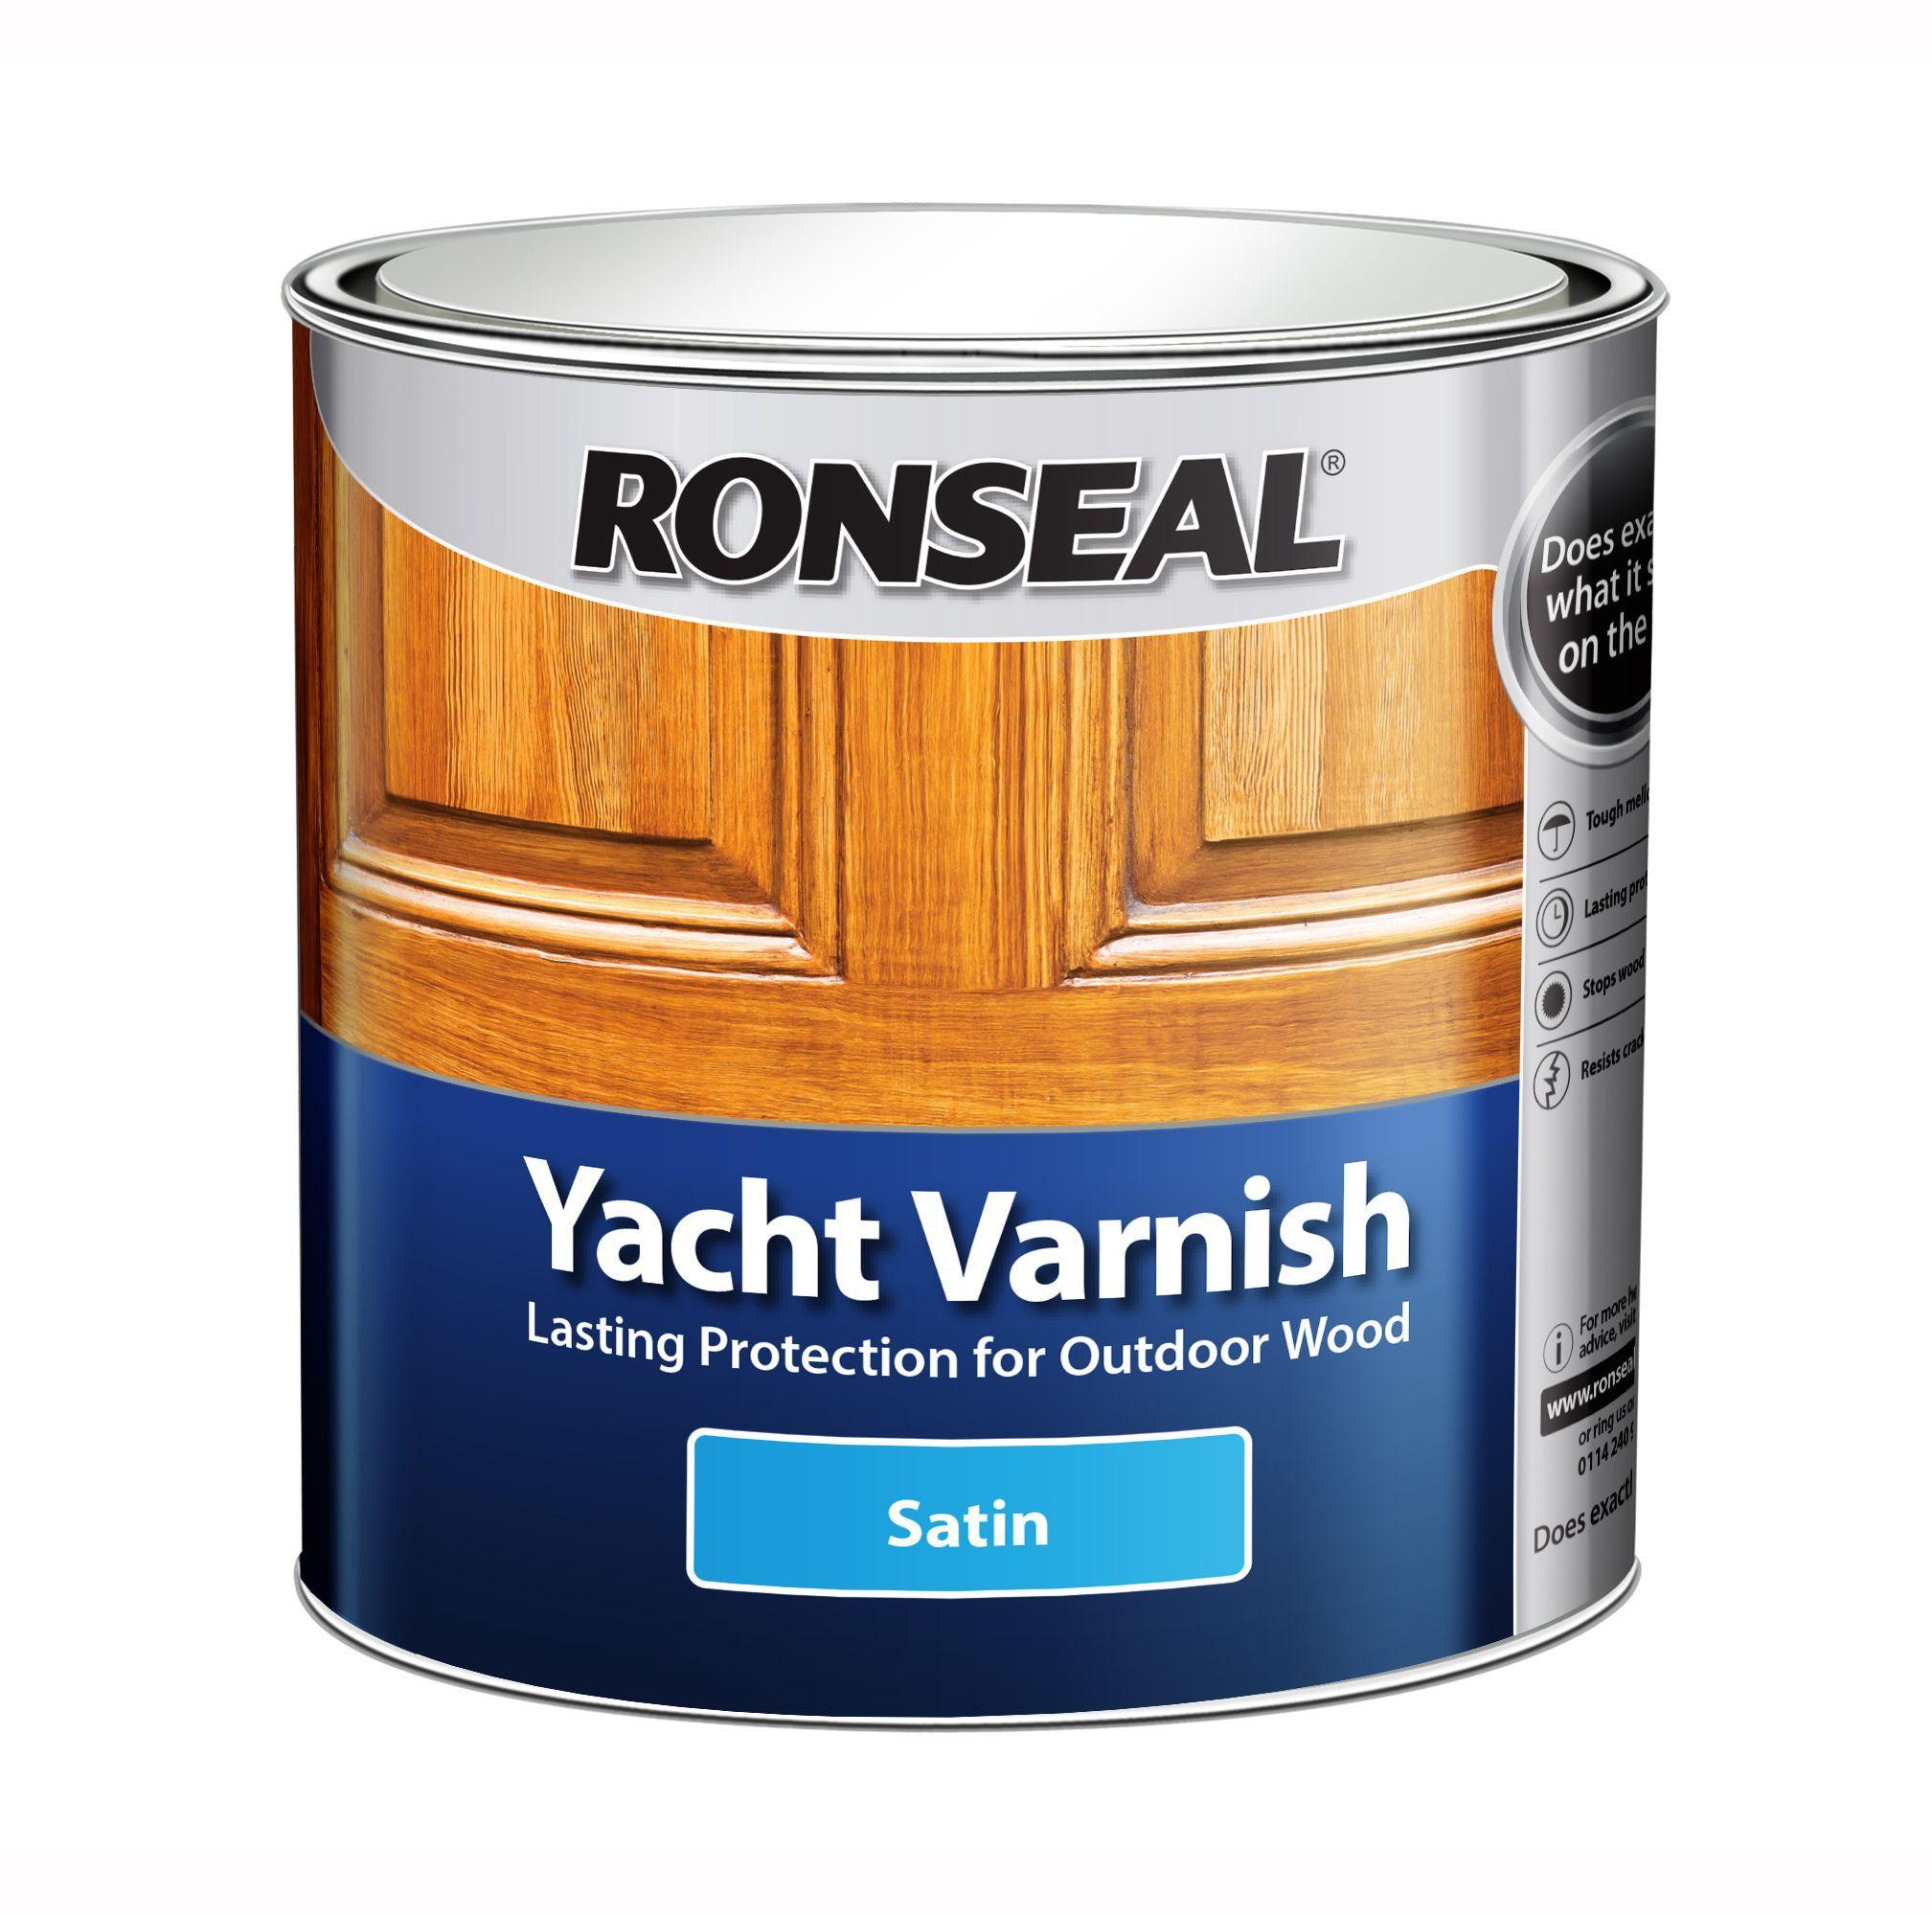 Ronseal Yacht Varnish Satin 500ml